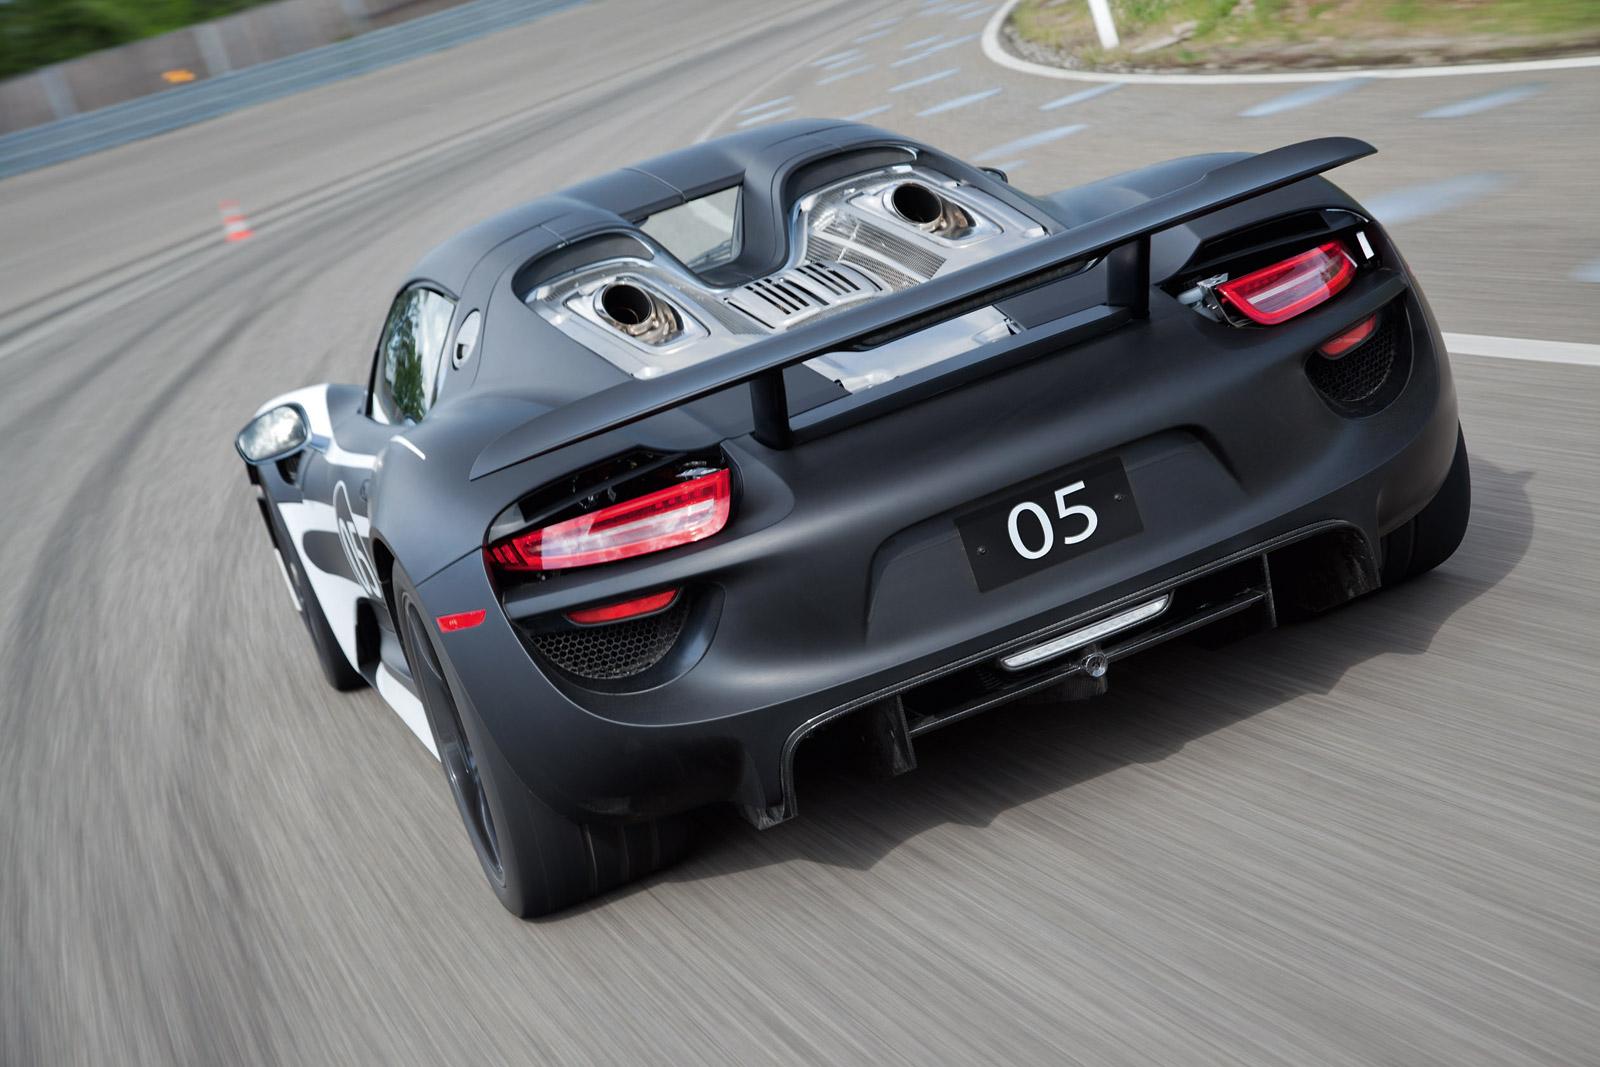 Porsche 918 Spyder Jail For Texting Karma Fire Car News Headlines